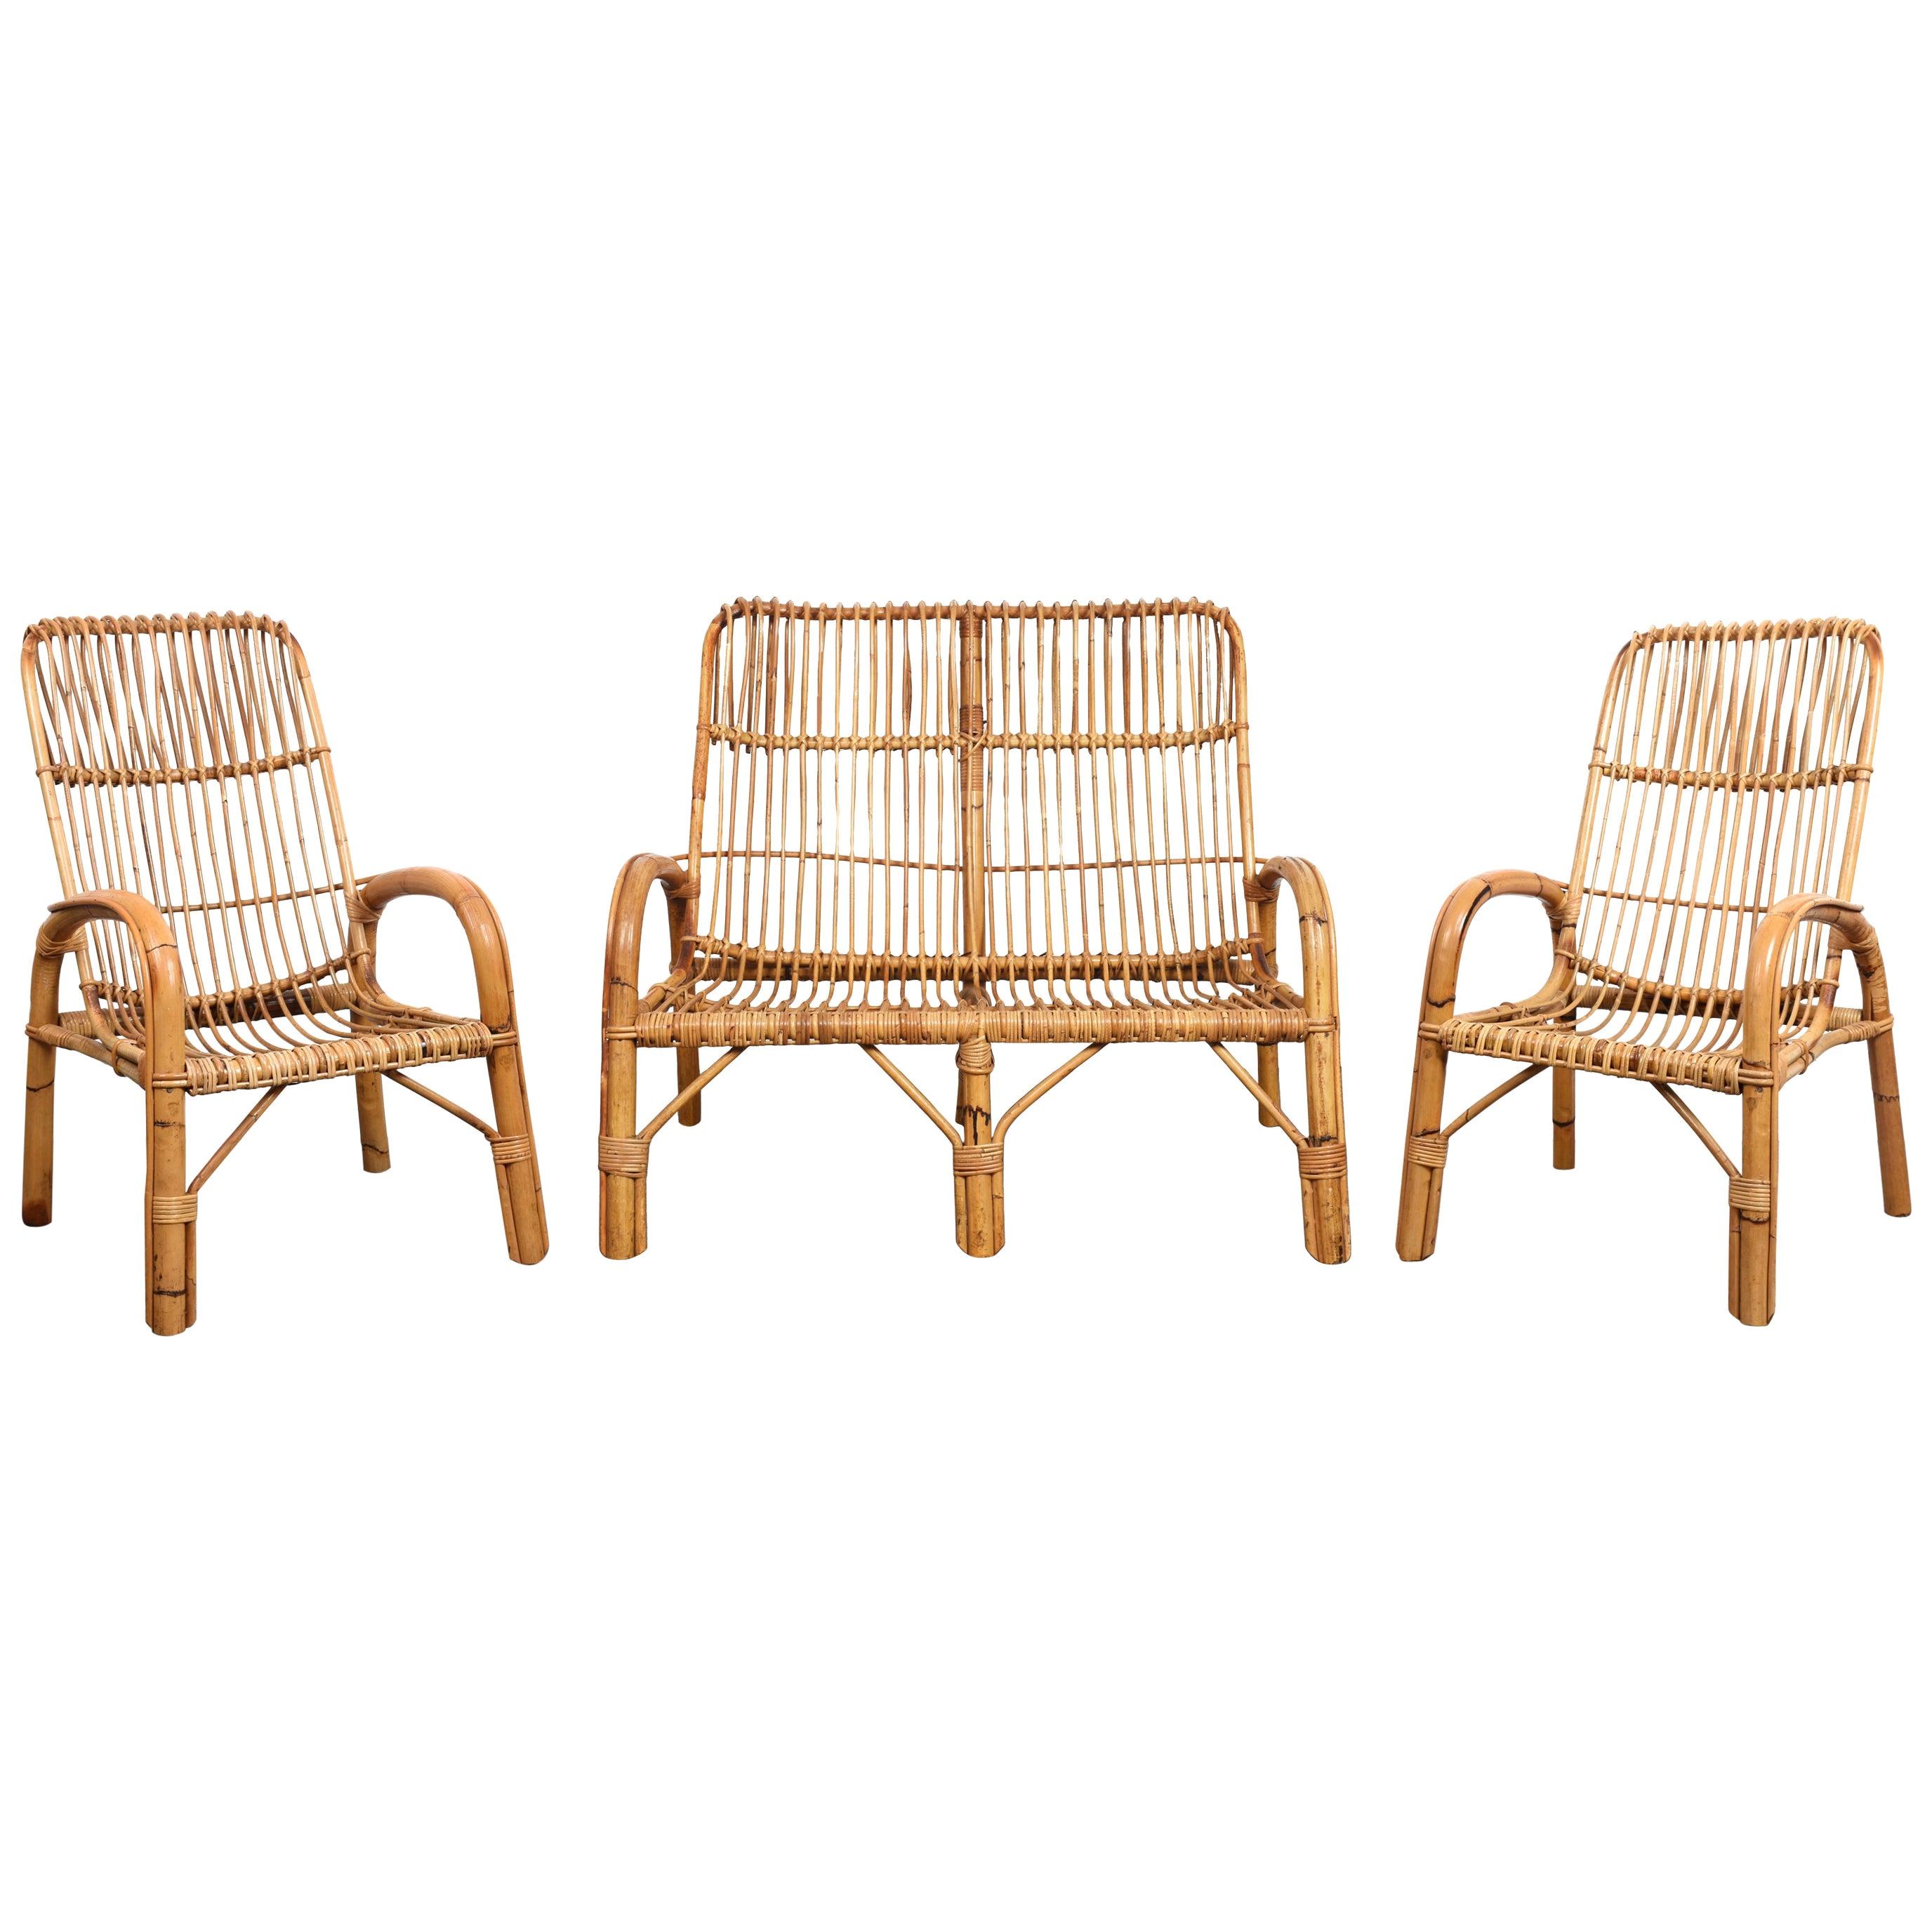 Midcentury French Riviera Italian Three Elements Bamboo and Rattan Set, 1960s